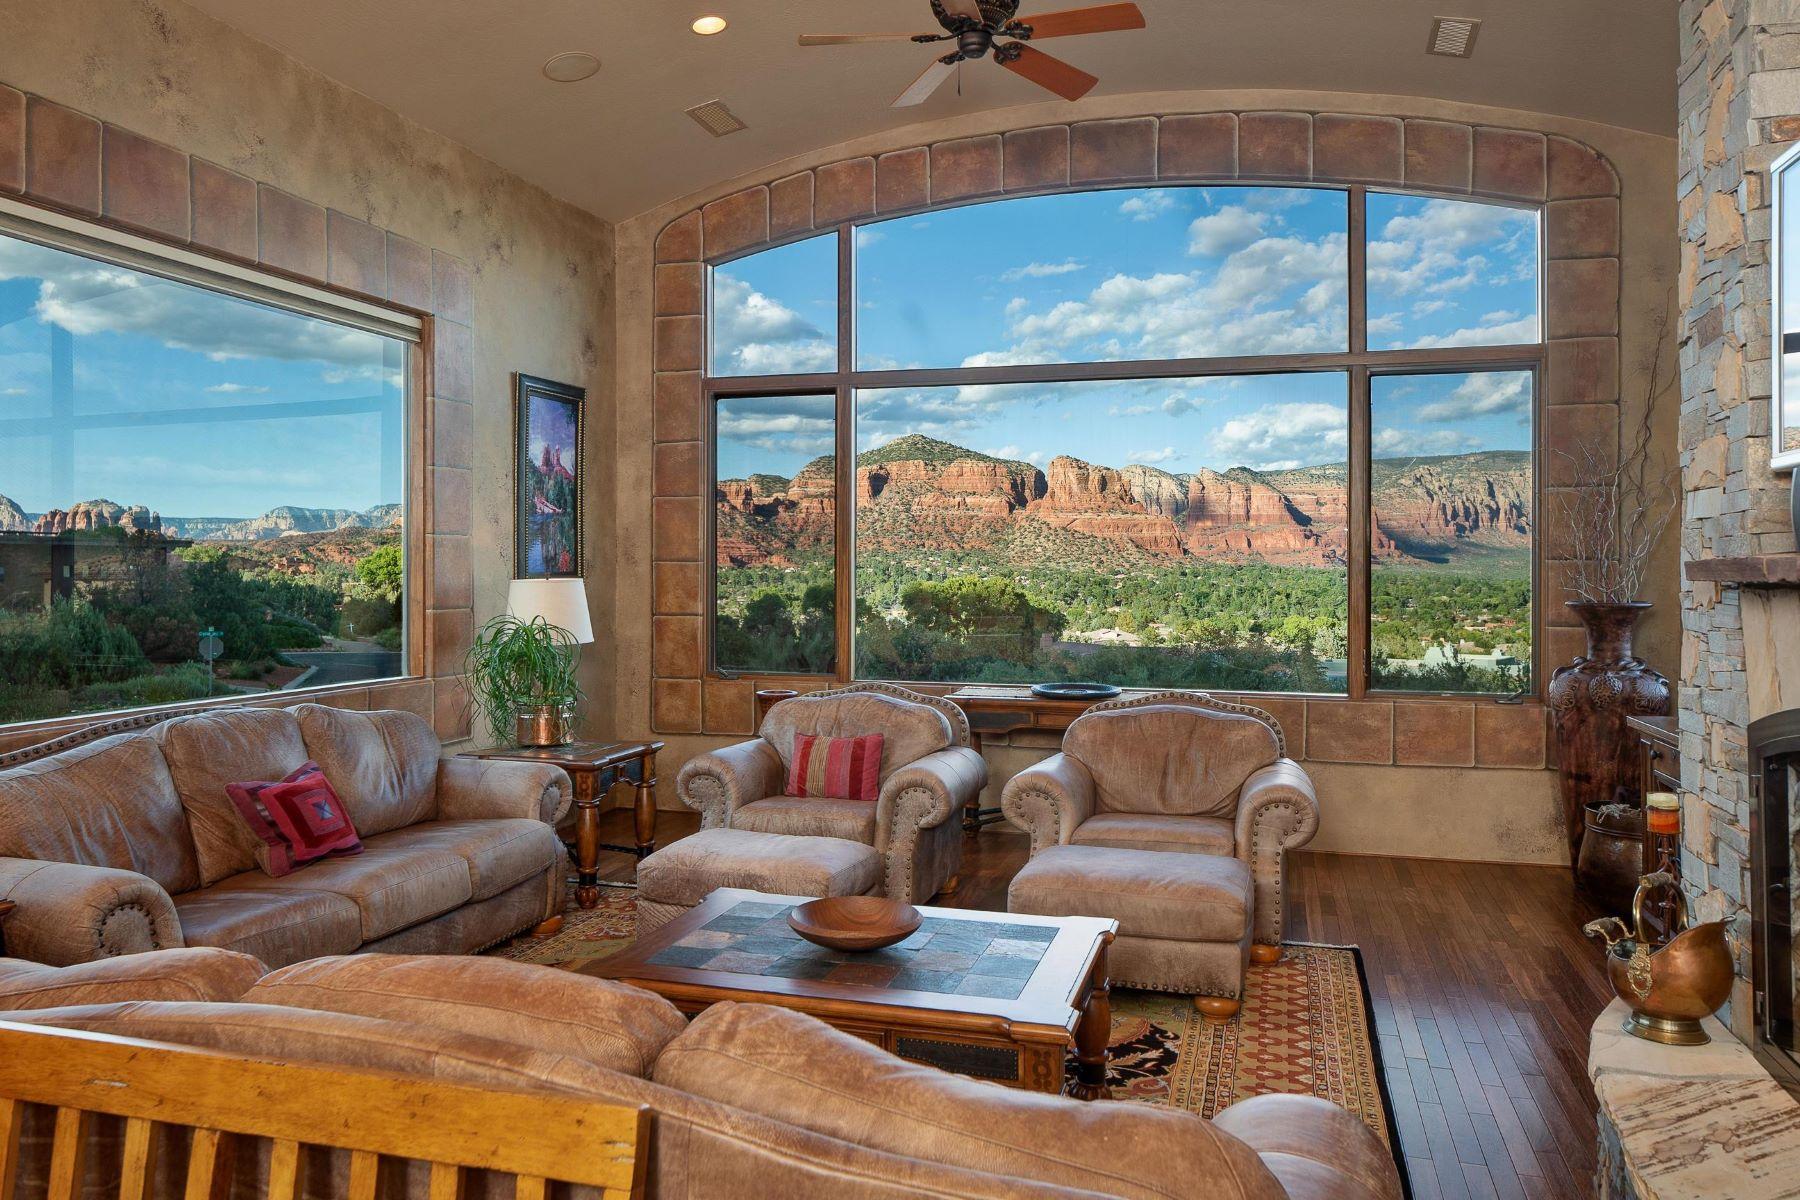 Single Family Homes for Active at Sedona Golf Resort 140 Crystal Sky Drive Sedona, Arizona 86351 United States